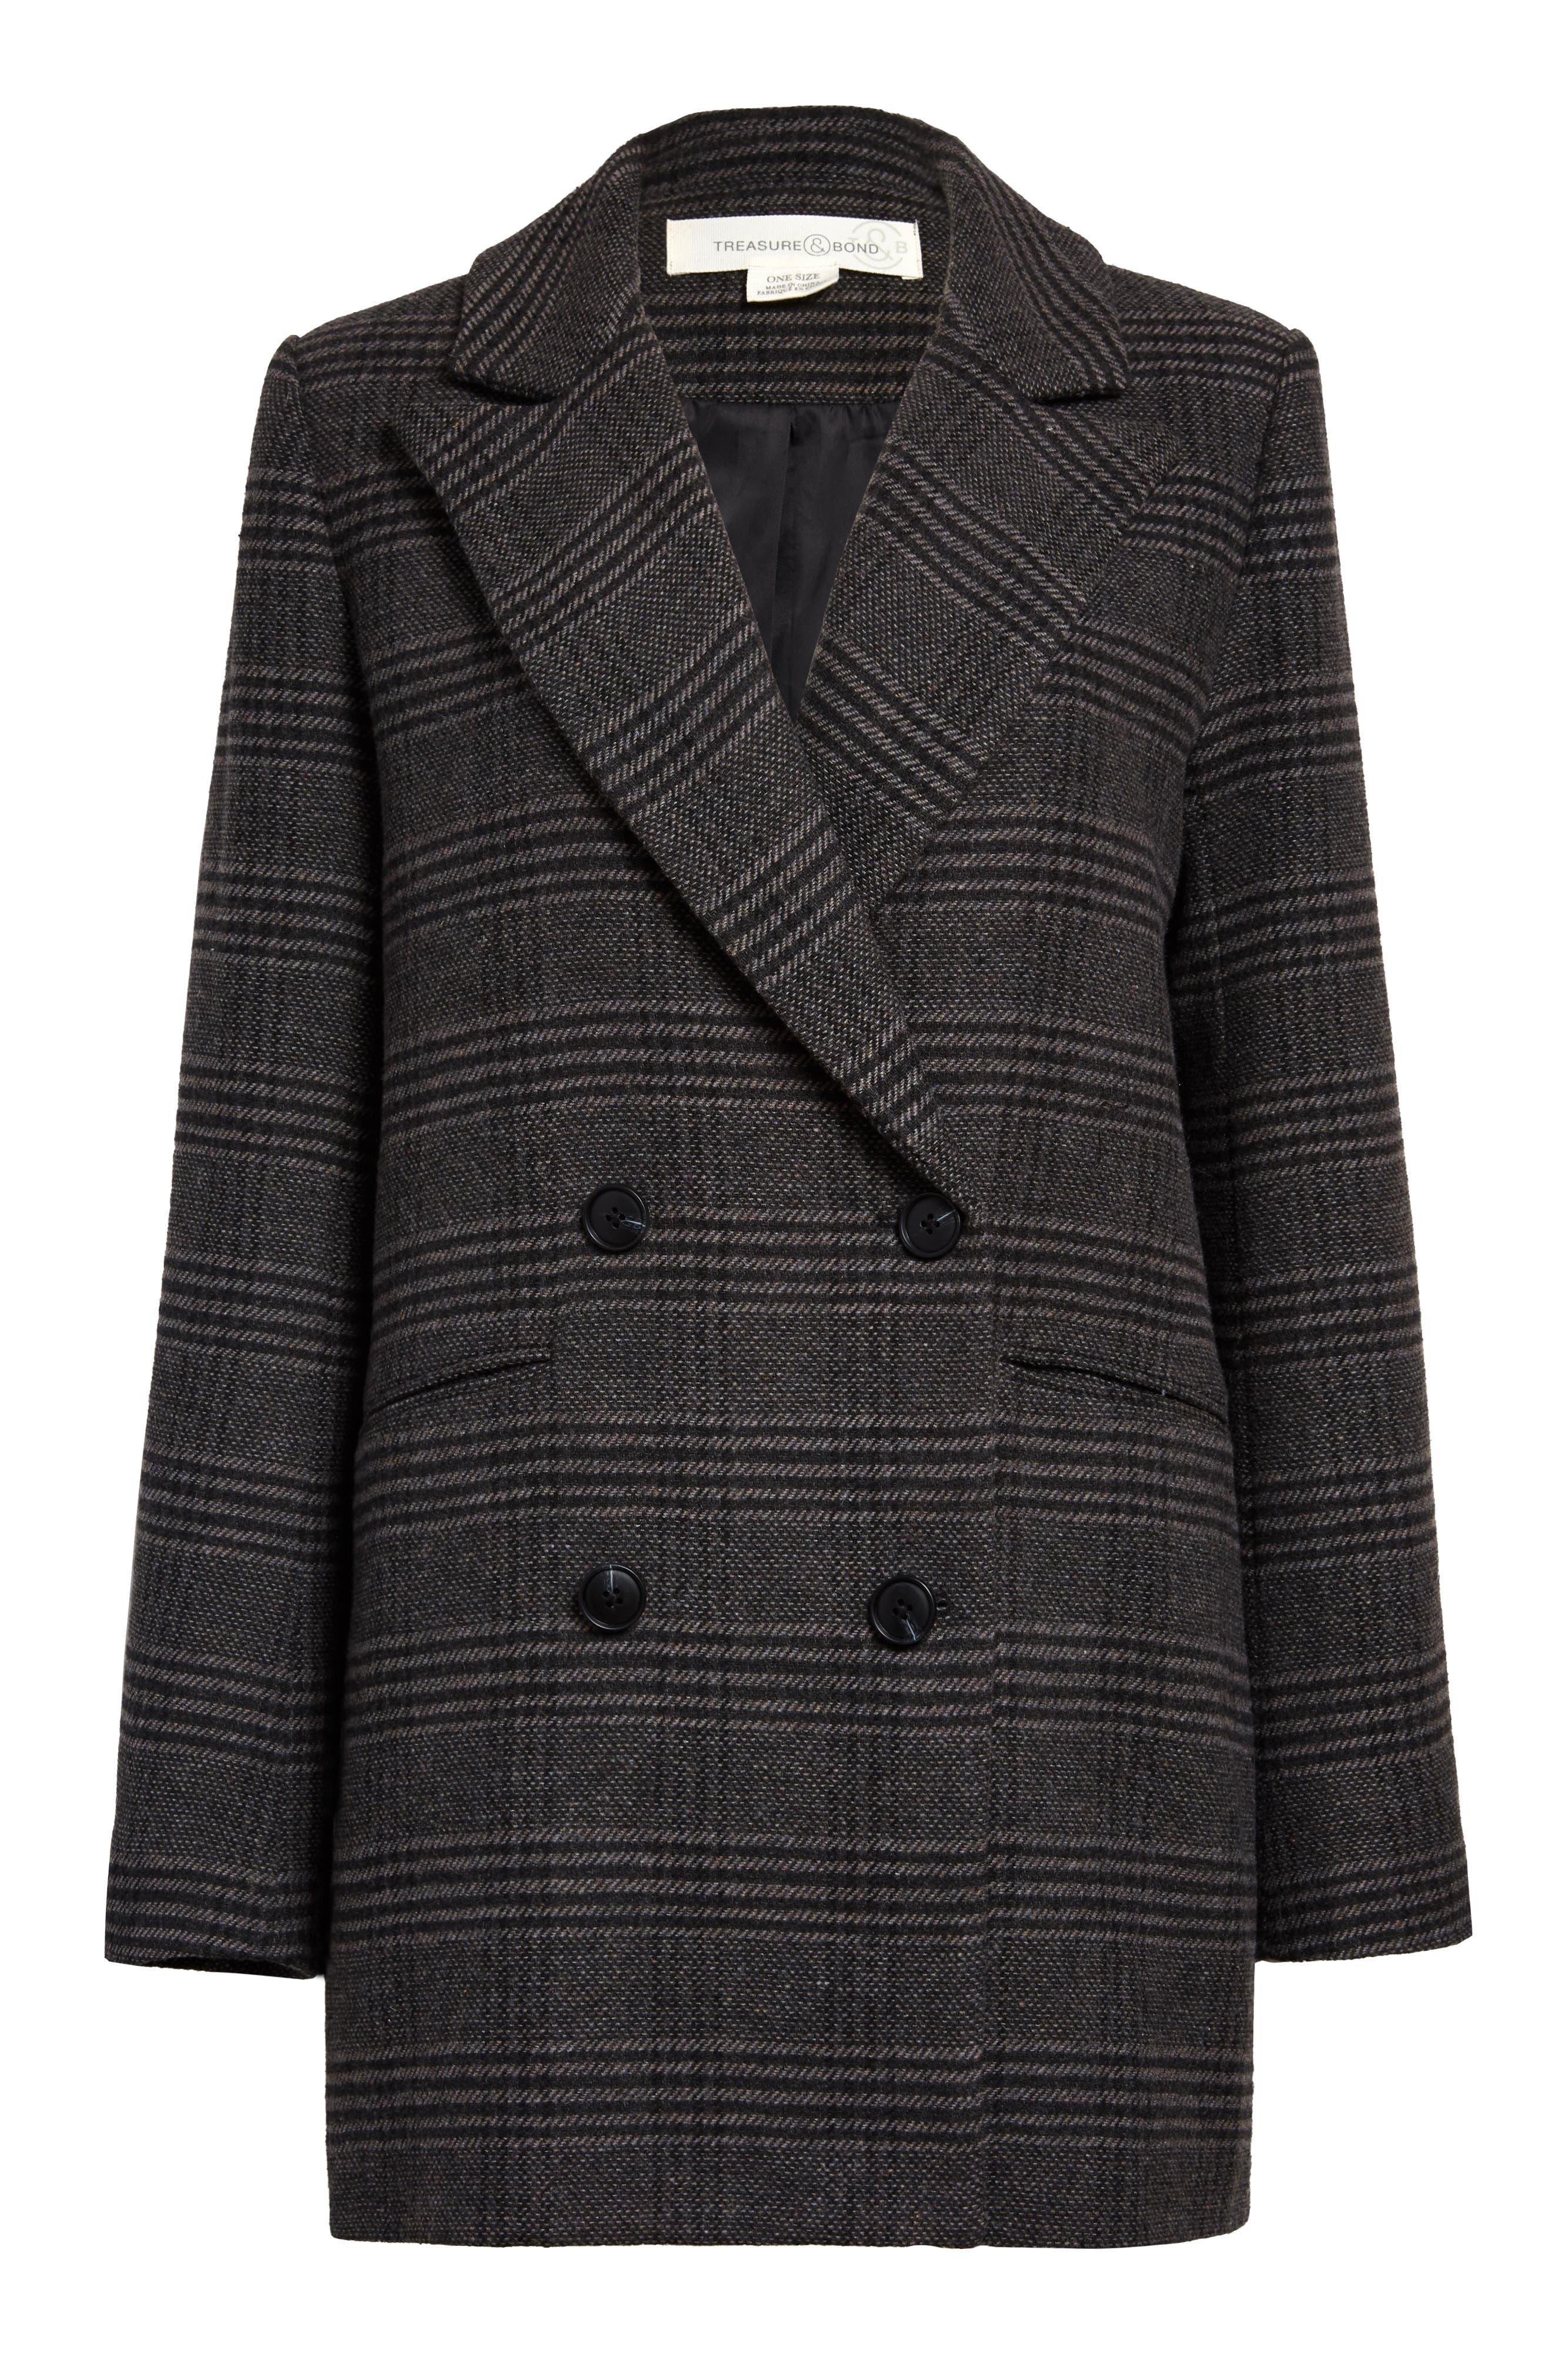 Treasure & Bond Two-Button Double Breasted Blazer Coat | Nordstrom